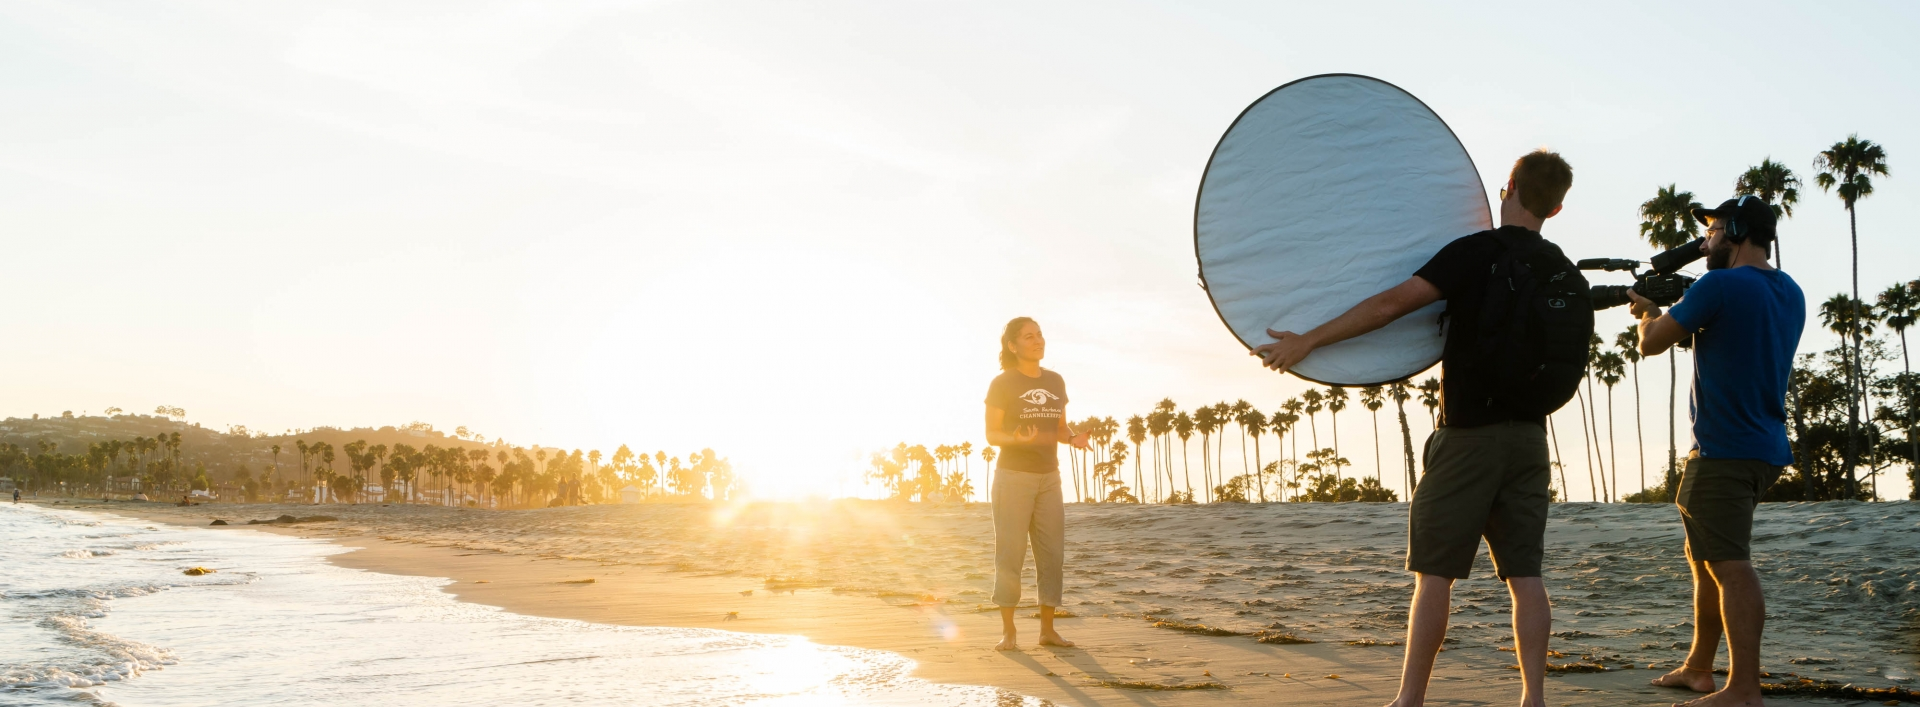 Video crew filming a woman talking on beach